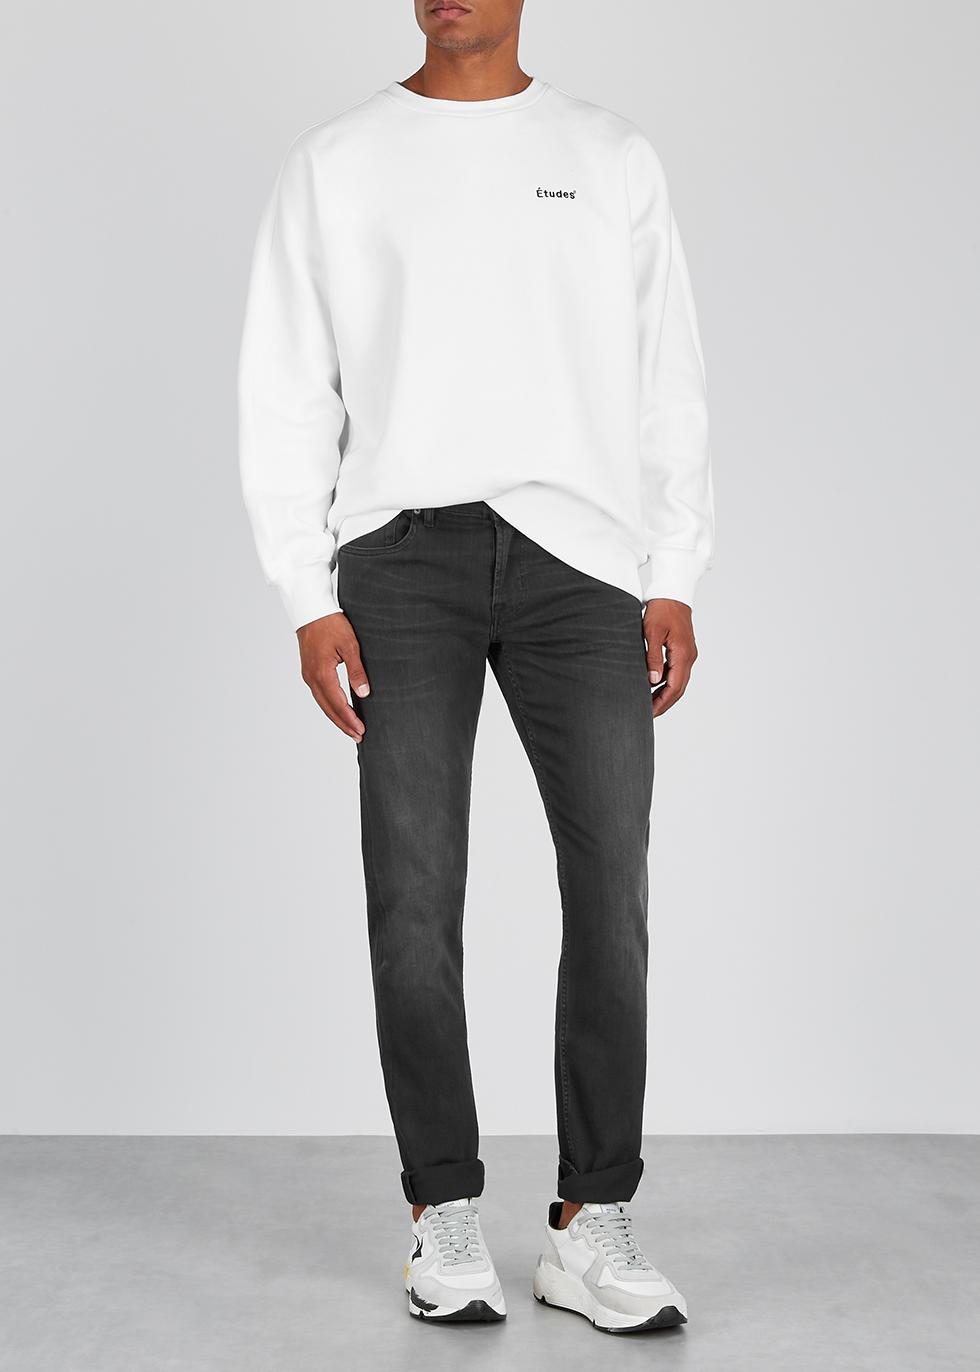 Slimmy black slim-leg jeans - 7 For All Mankind